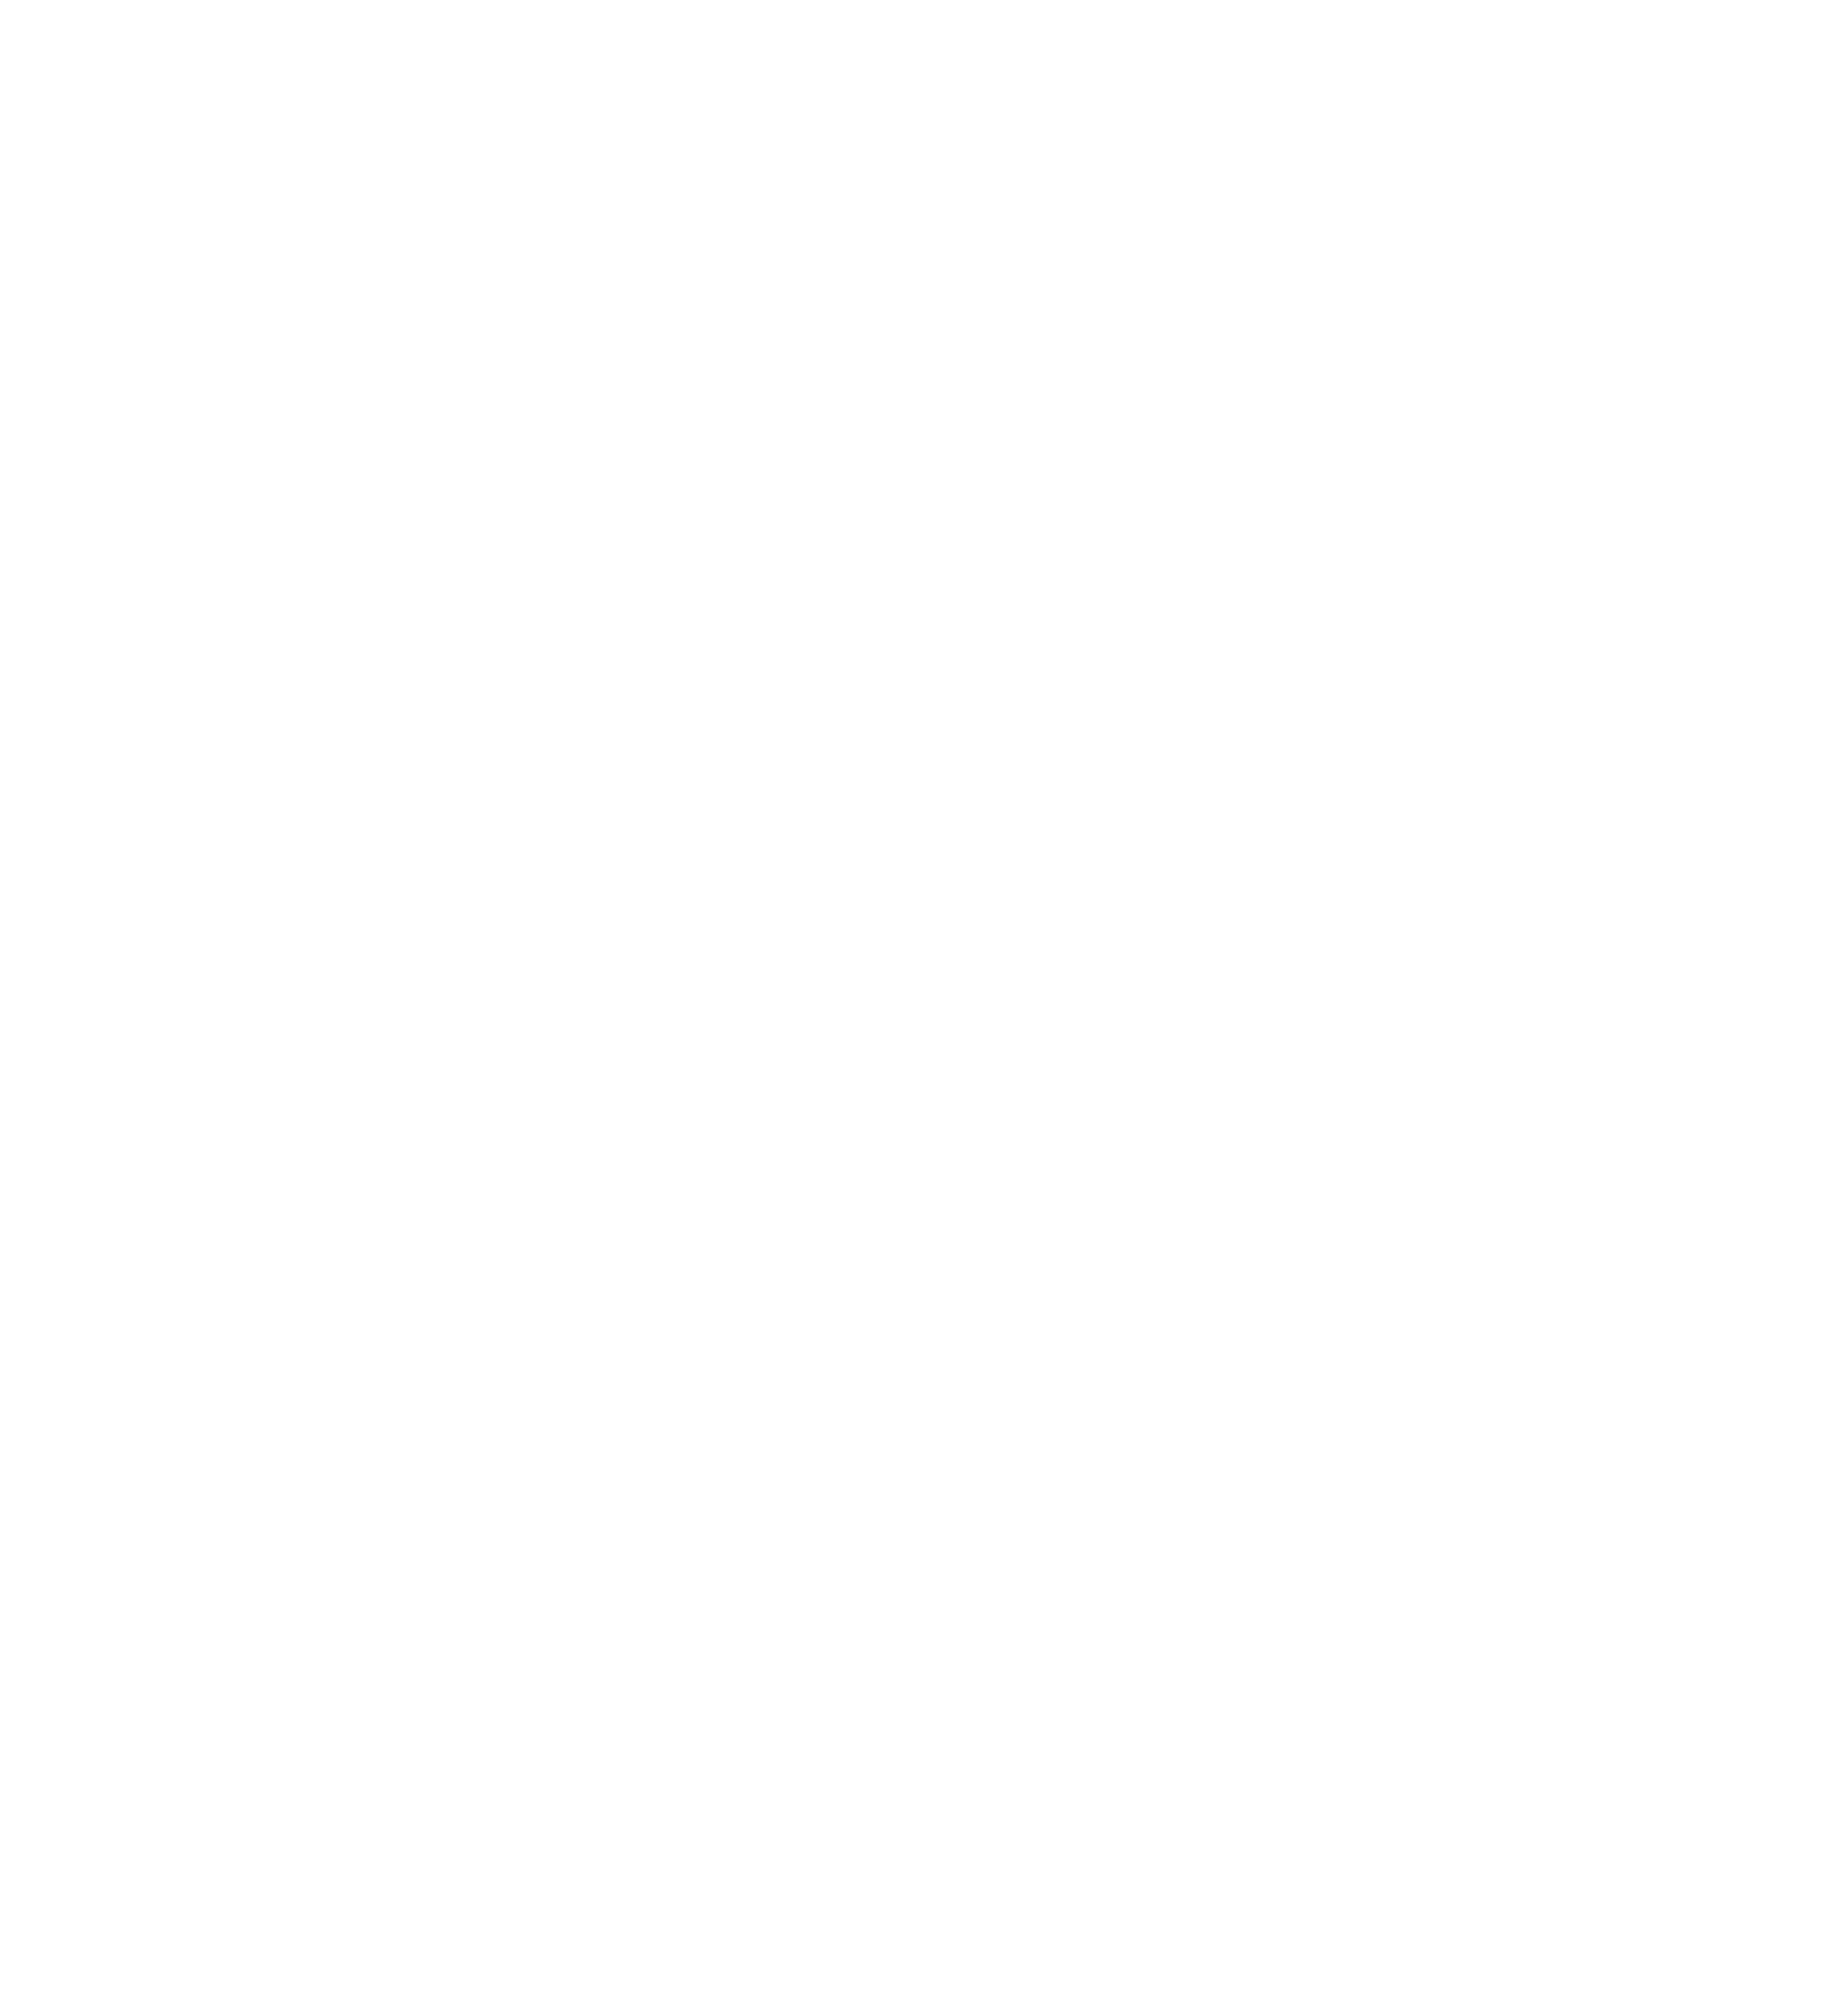 TCG - Pattern